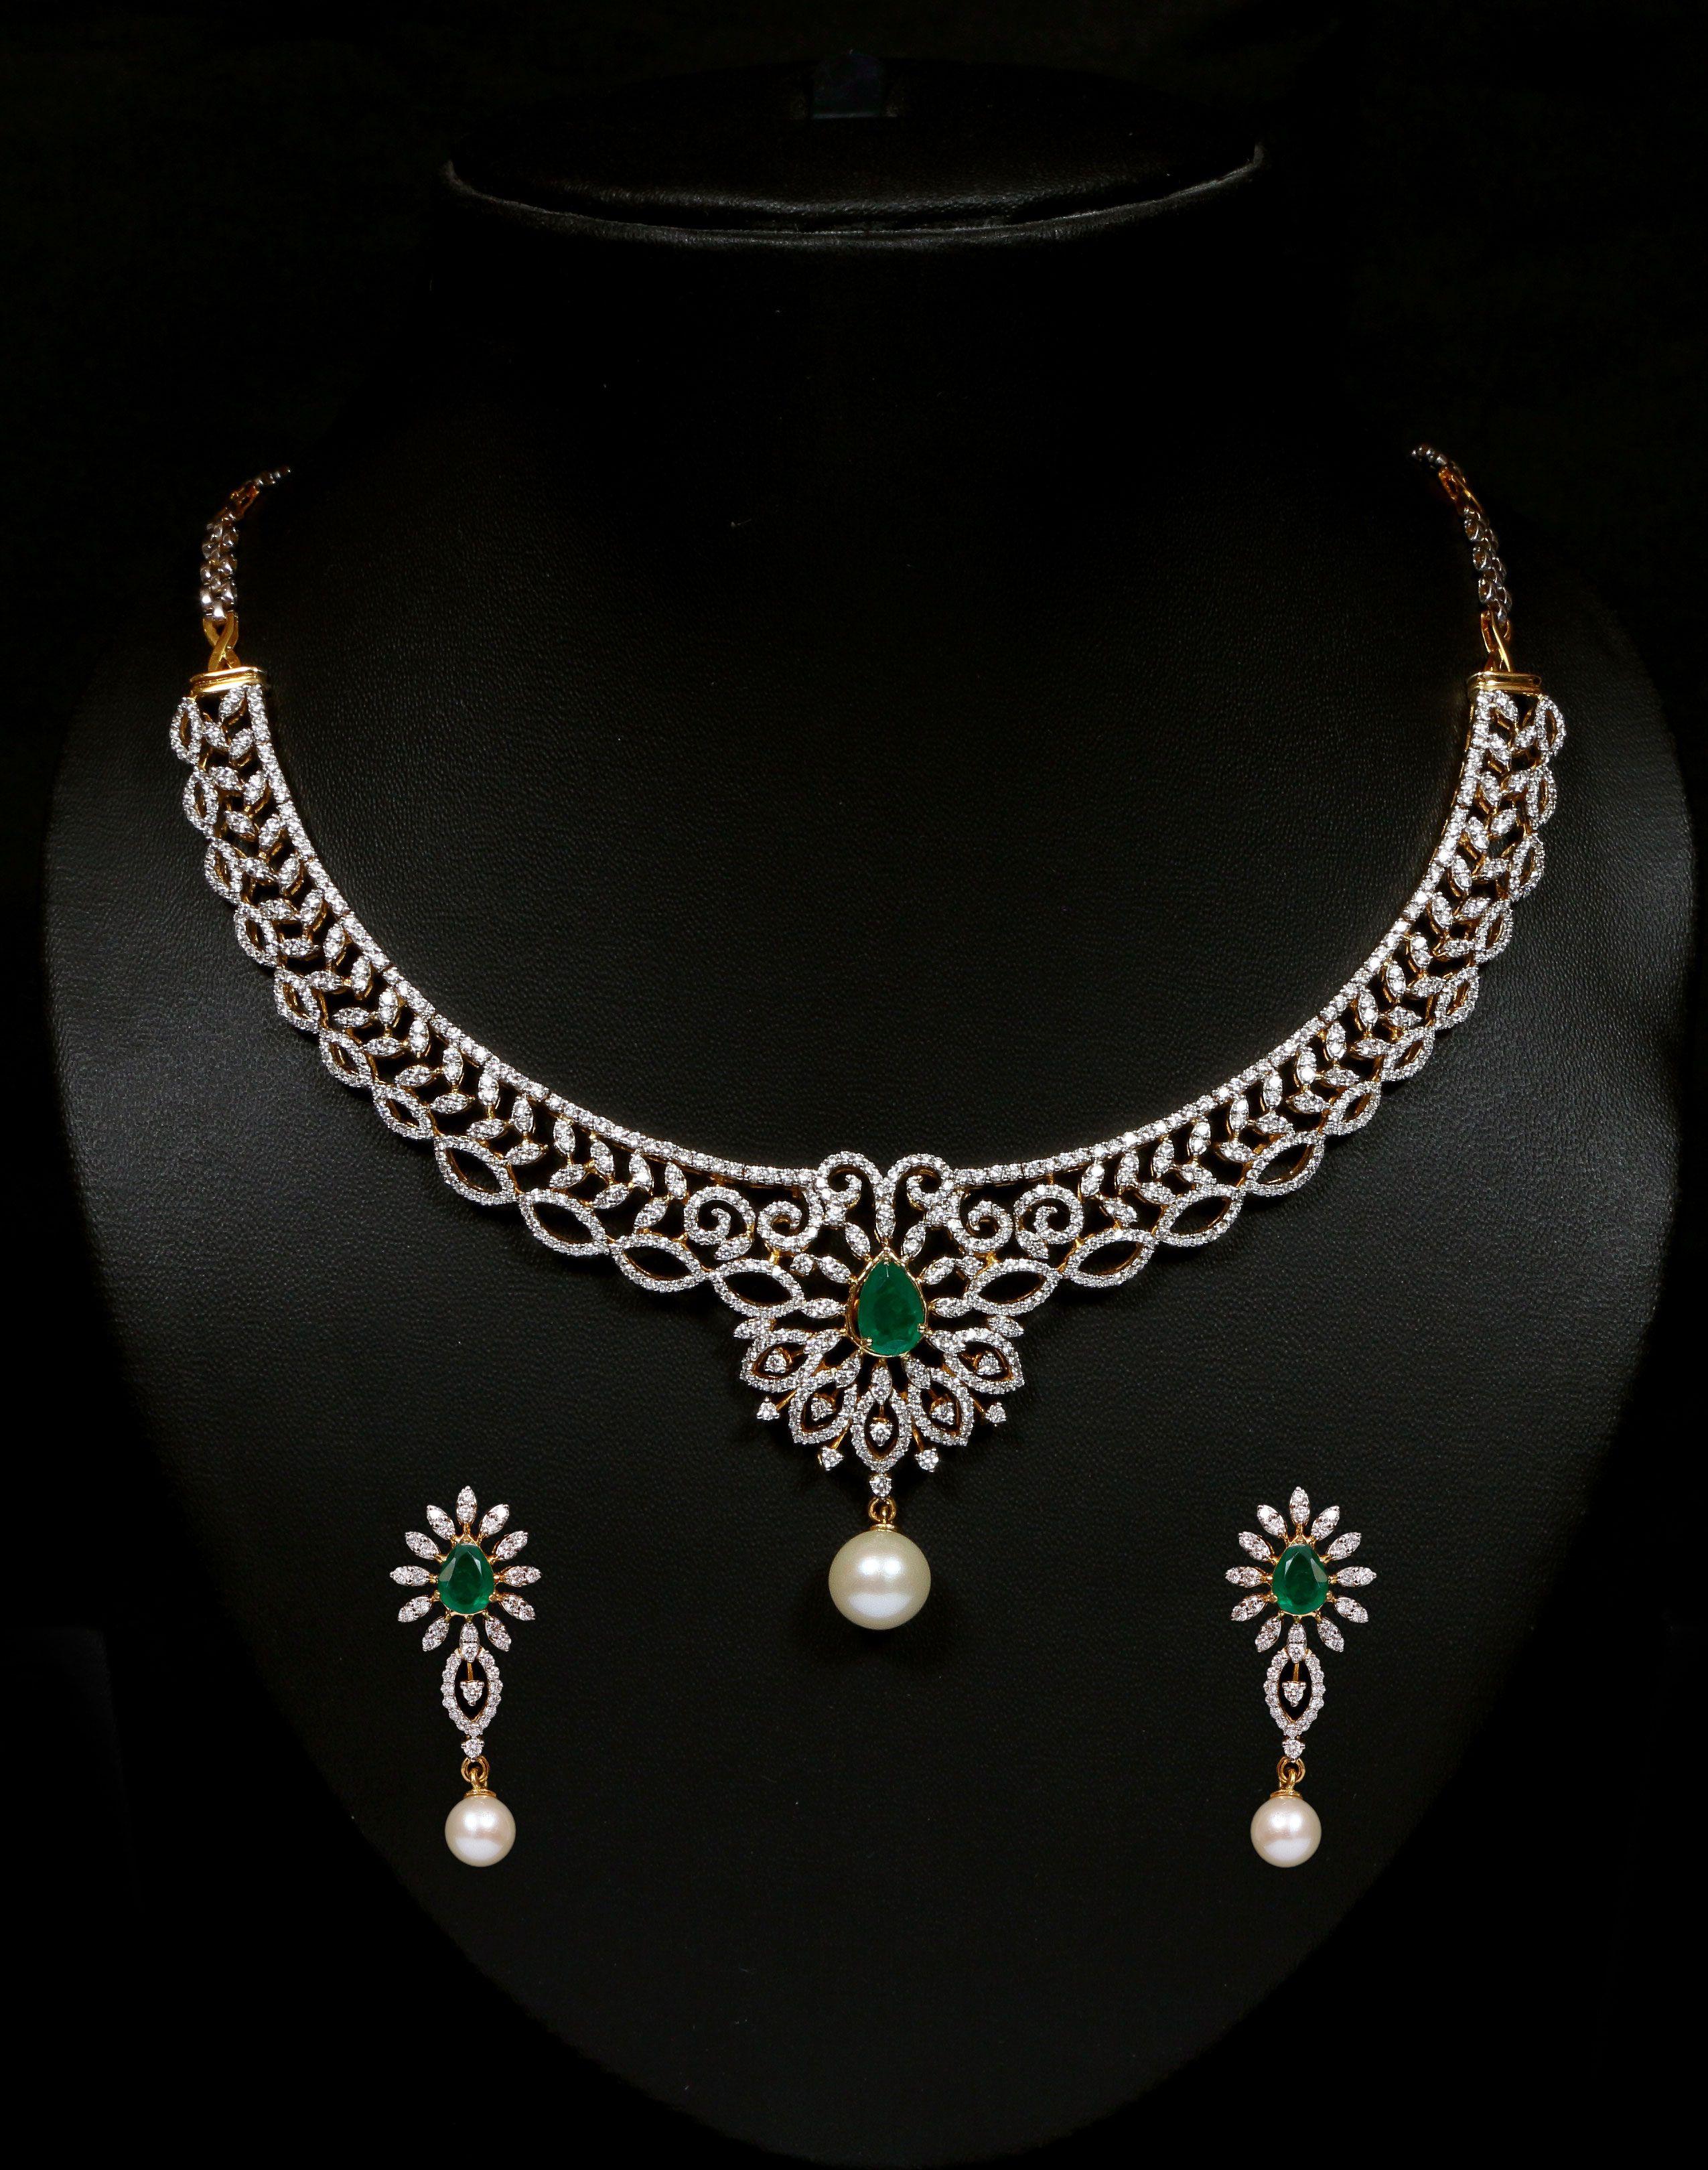 Diamond and emerald necklace set vummidi bangaru jewellers diamond and emerald necklace set vummidi bangaru jewellers aloadofball Choice Image